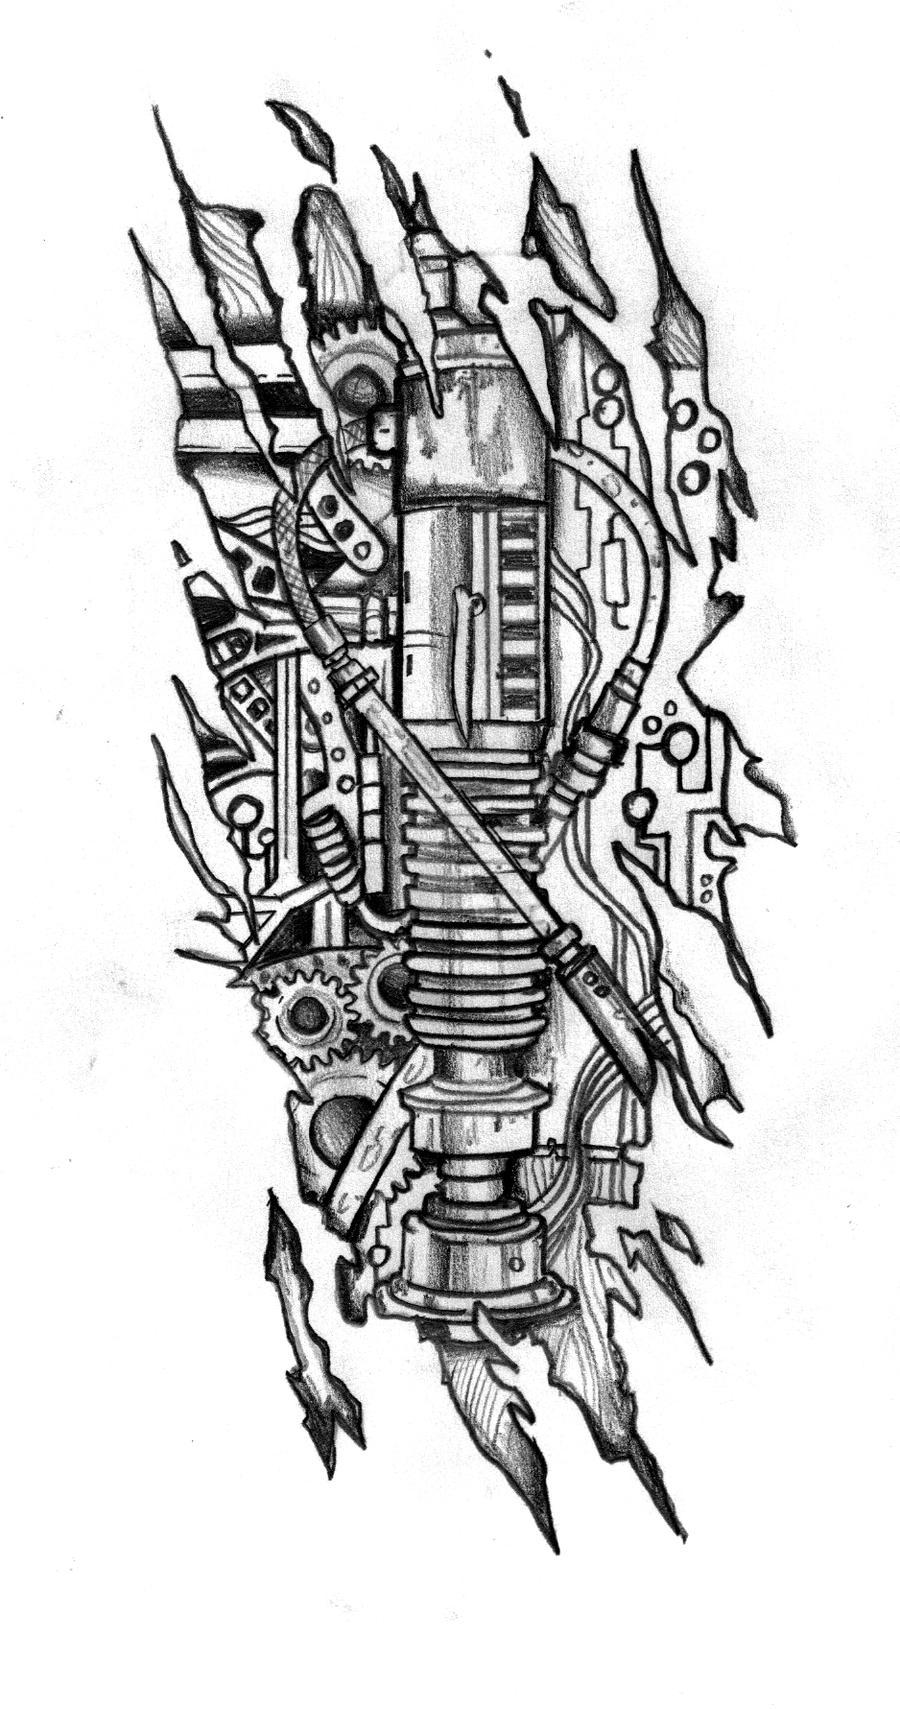 biomechanic lightsaber tattoo design by customartwerk on deviantart. Black Bedroom Furniture Sets. Home Design Ideas